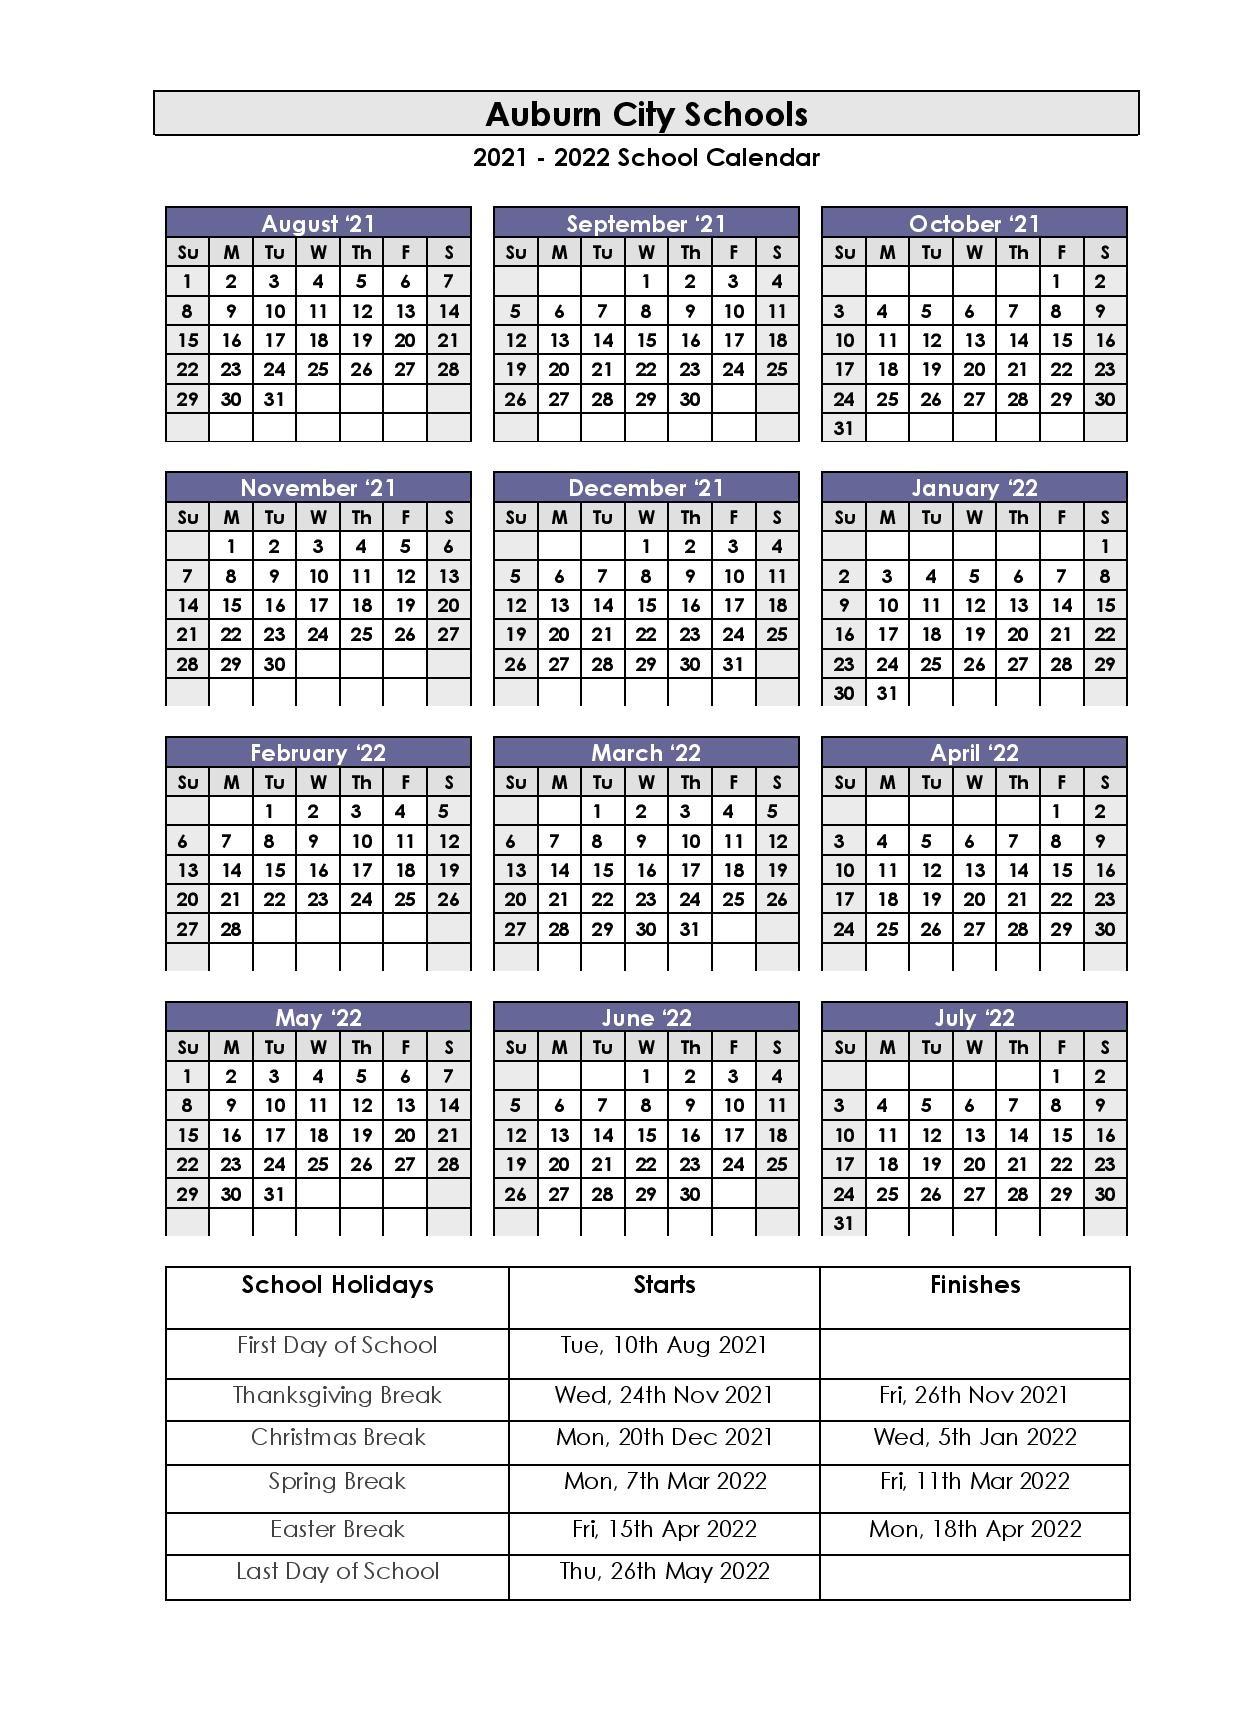 Auburn City School Holidays 2021-2022